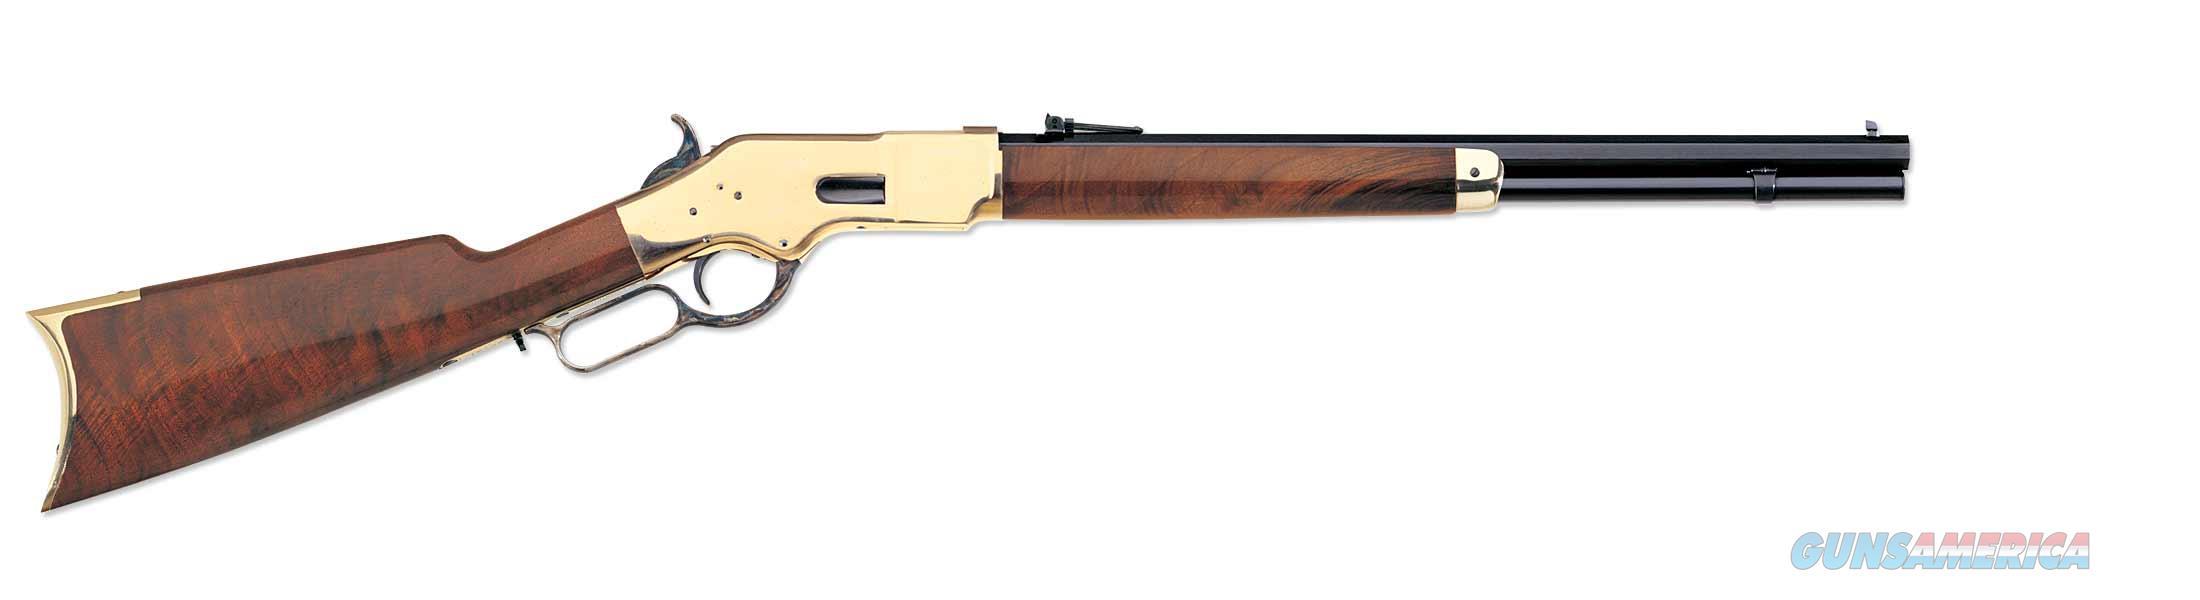 "Uberti 1866 Yellowboy Short Rifle .38 Special 20"" 342210   Guns > Rifles > Uberti Rifles > Lever Action"